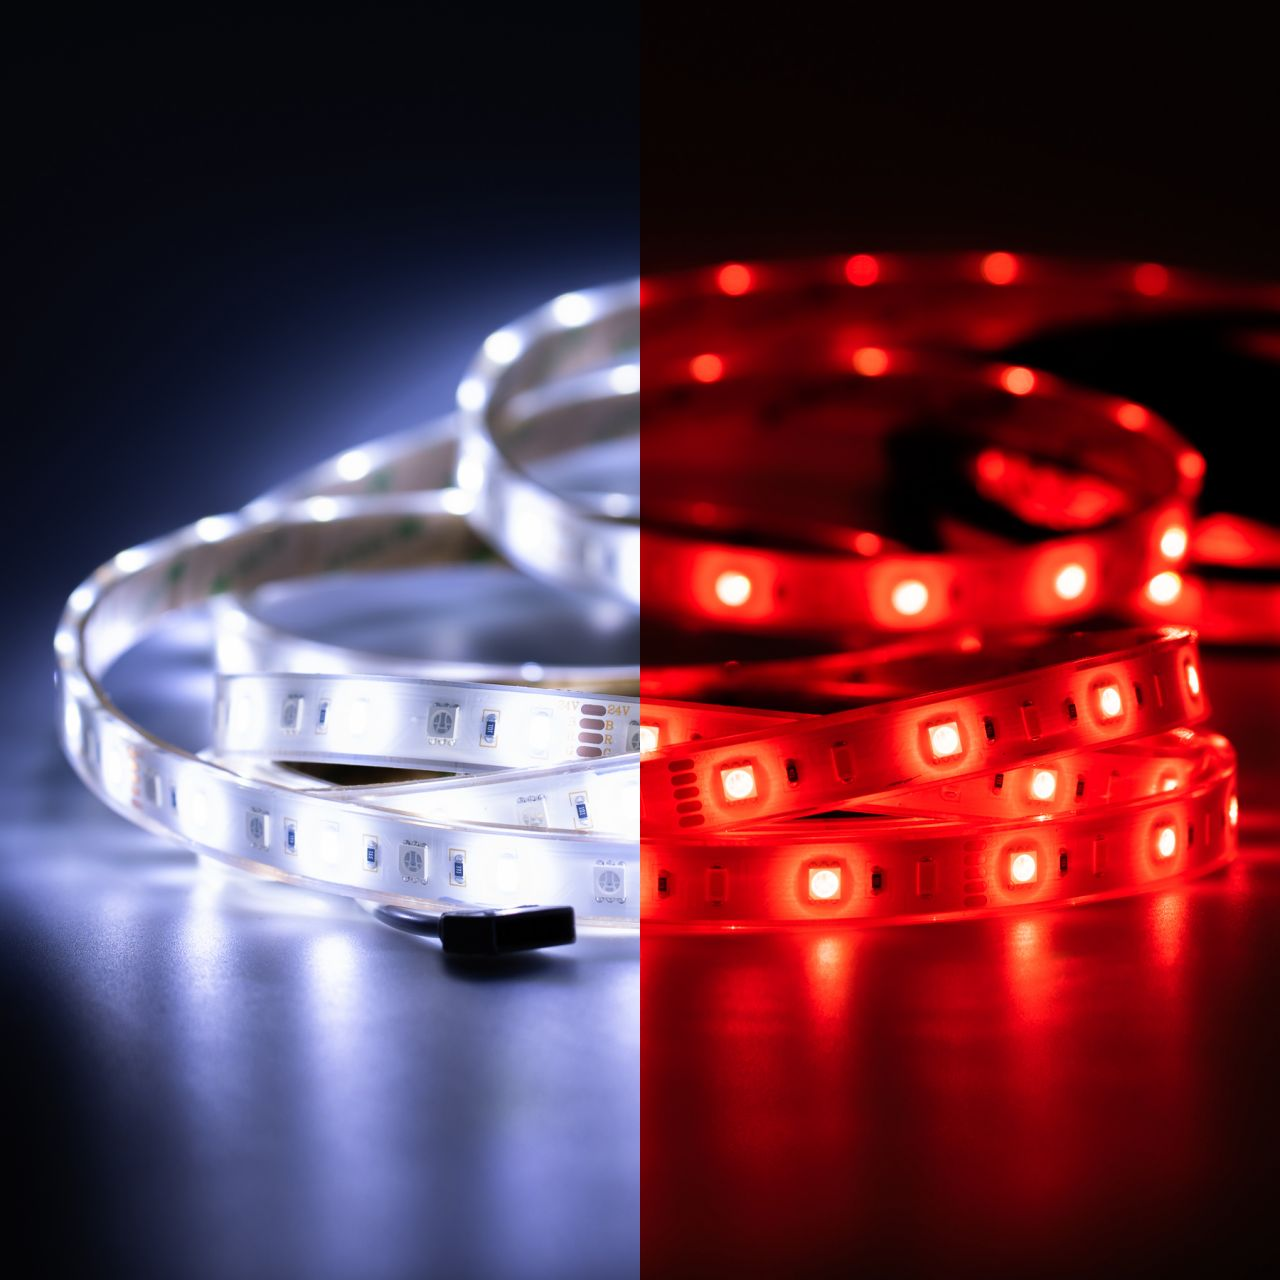 24V wasserfester LED Streifen – RGBW – 500cm – IP67